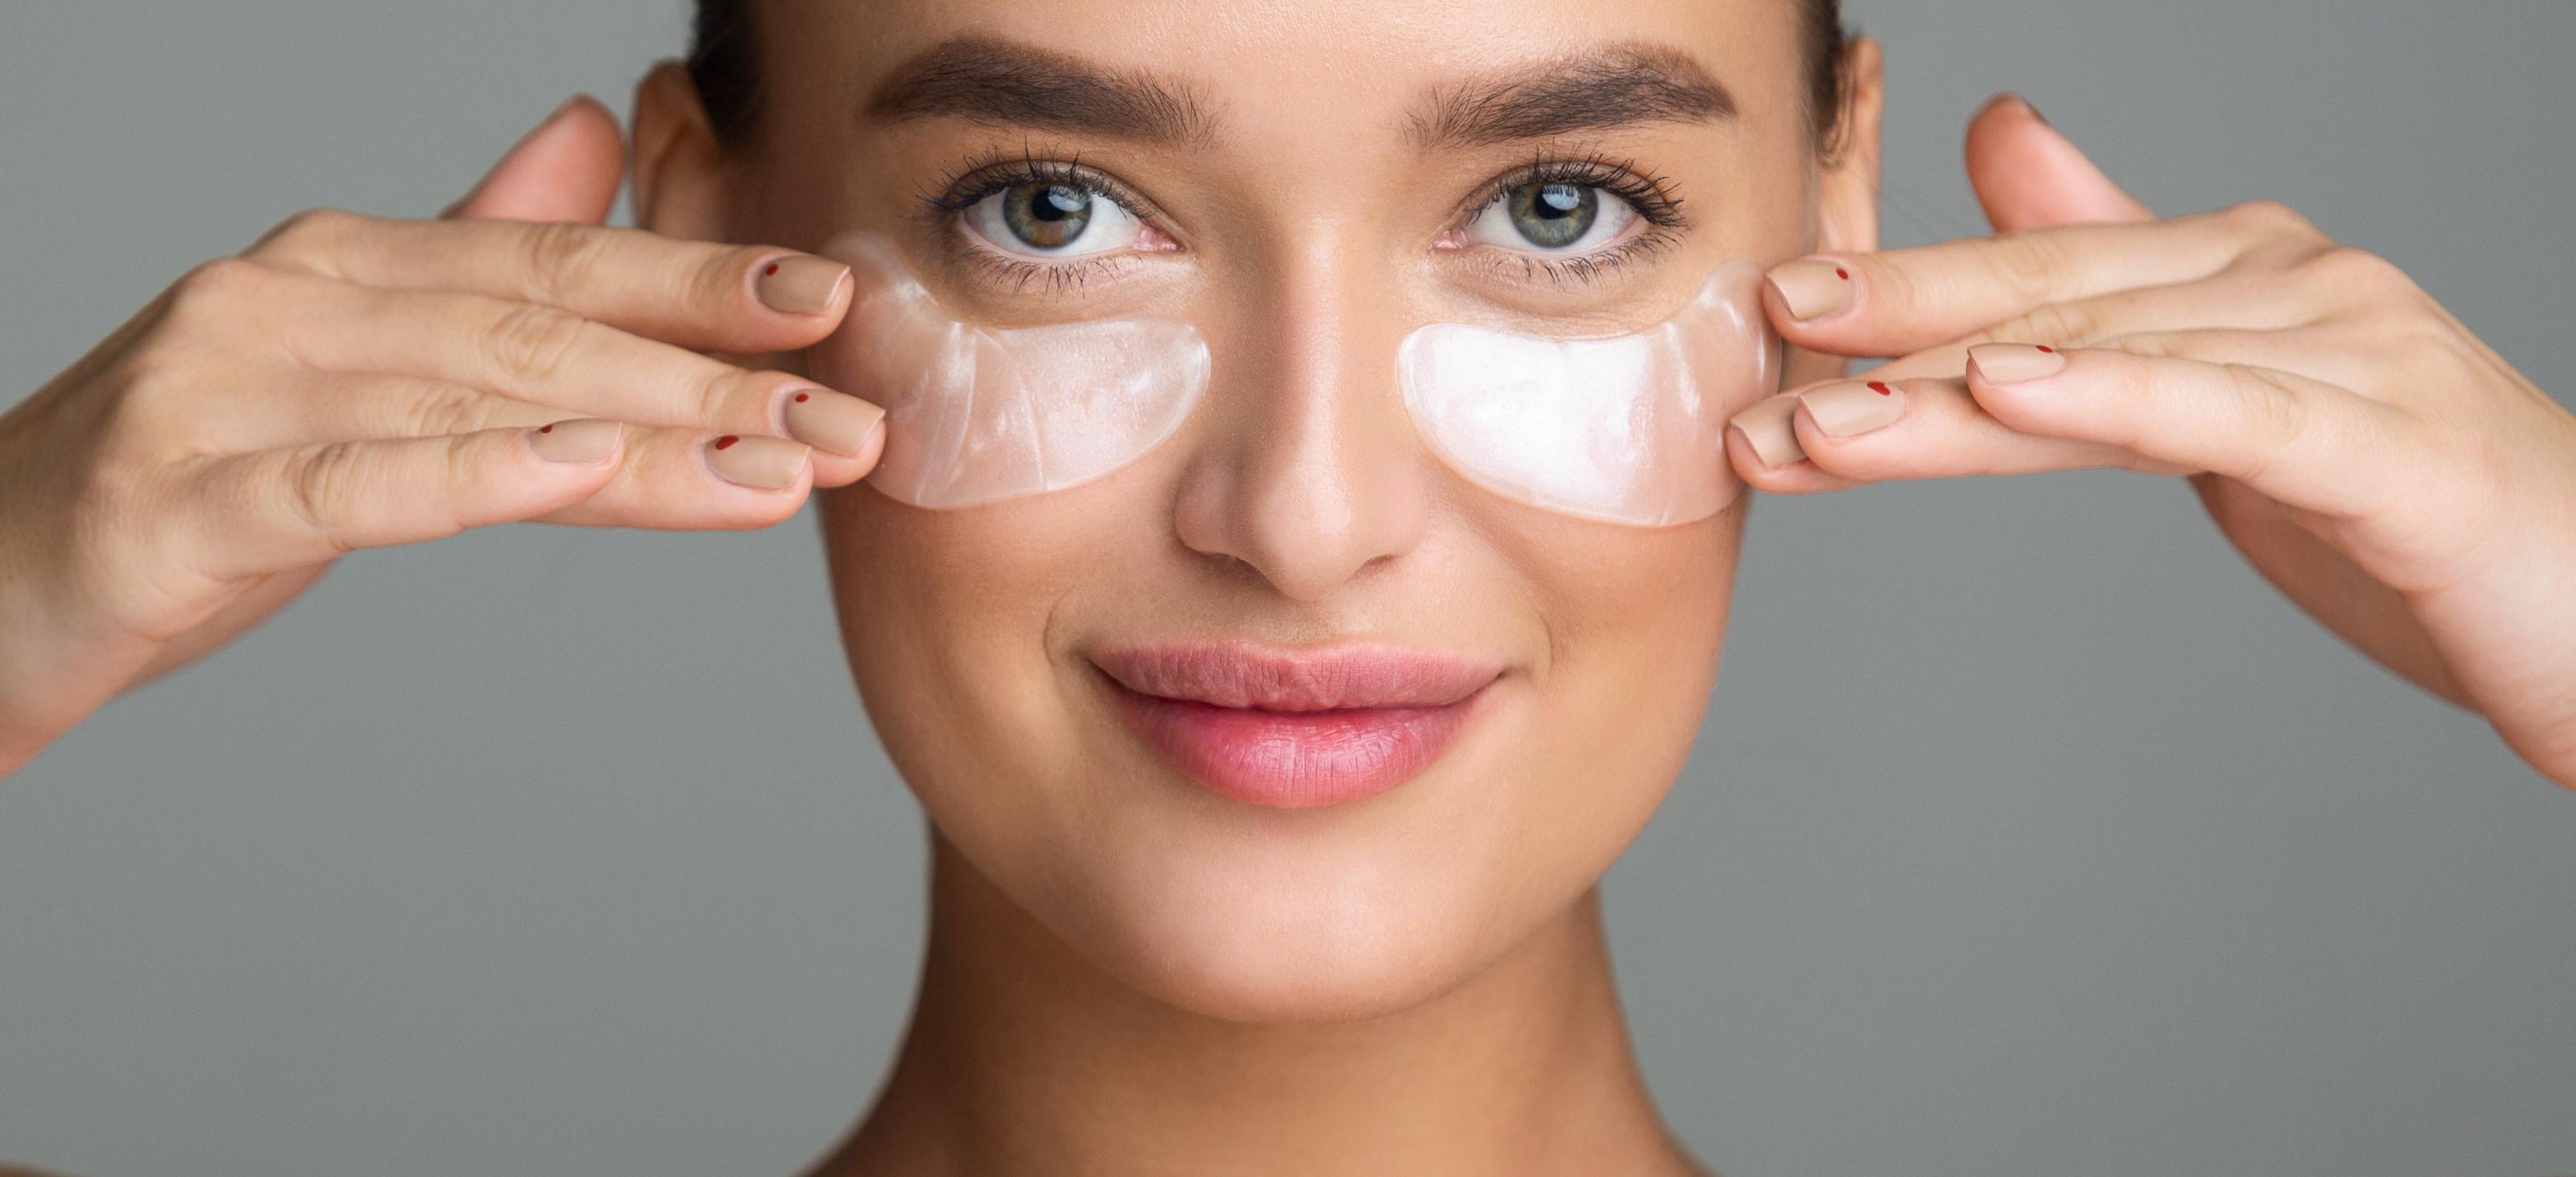 Trucos de Belleza: Aprende a cubrir tus ojeras de manera correcta